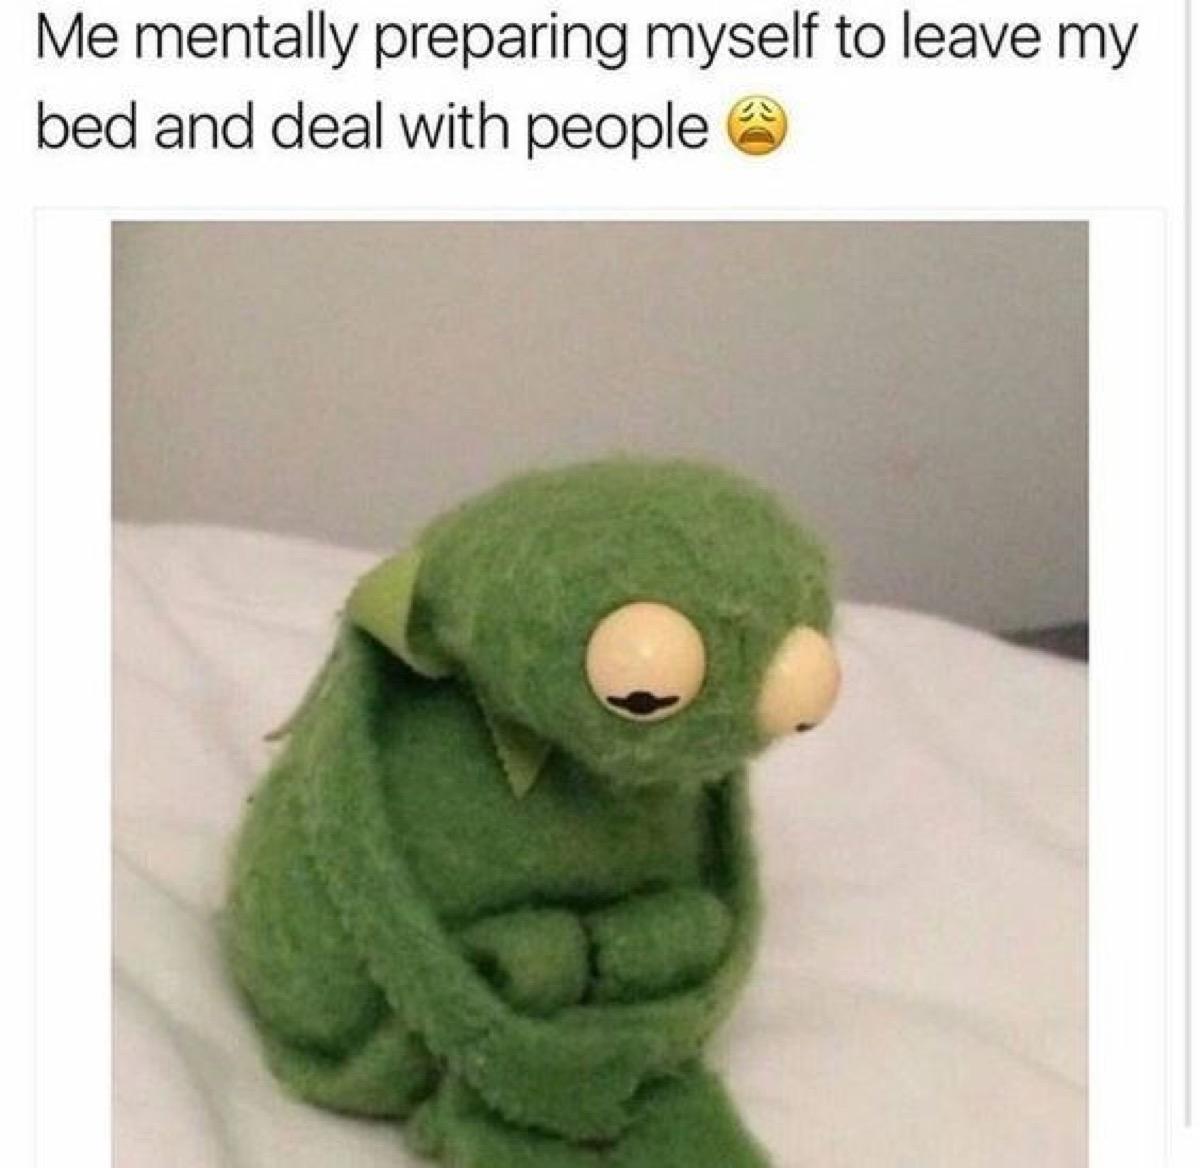 Sad Kermit Monday meme